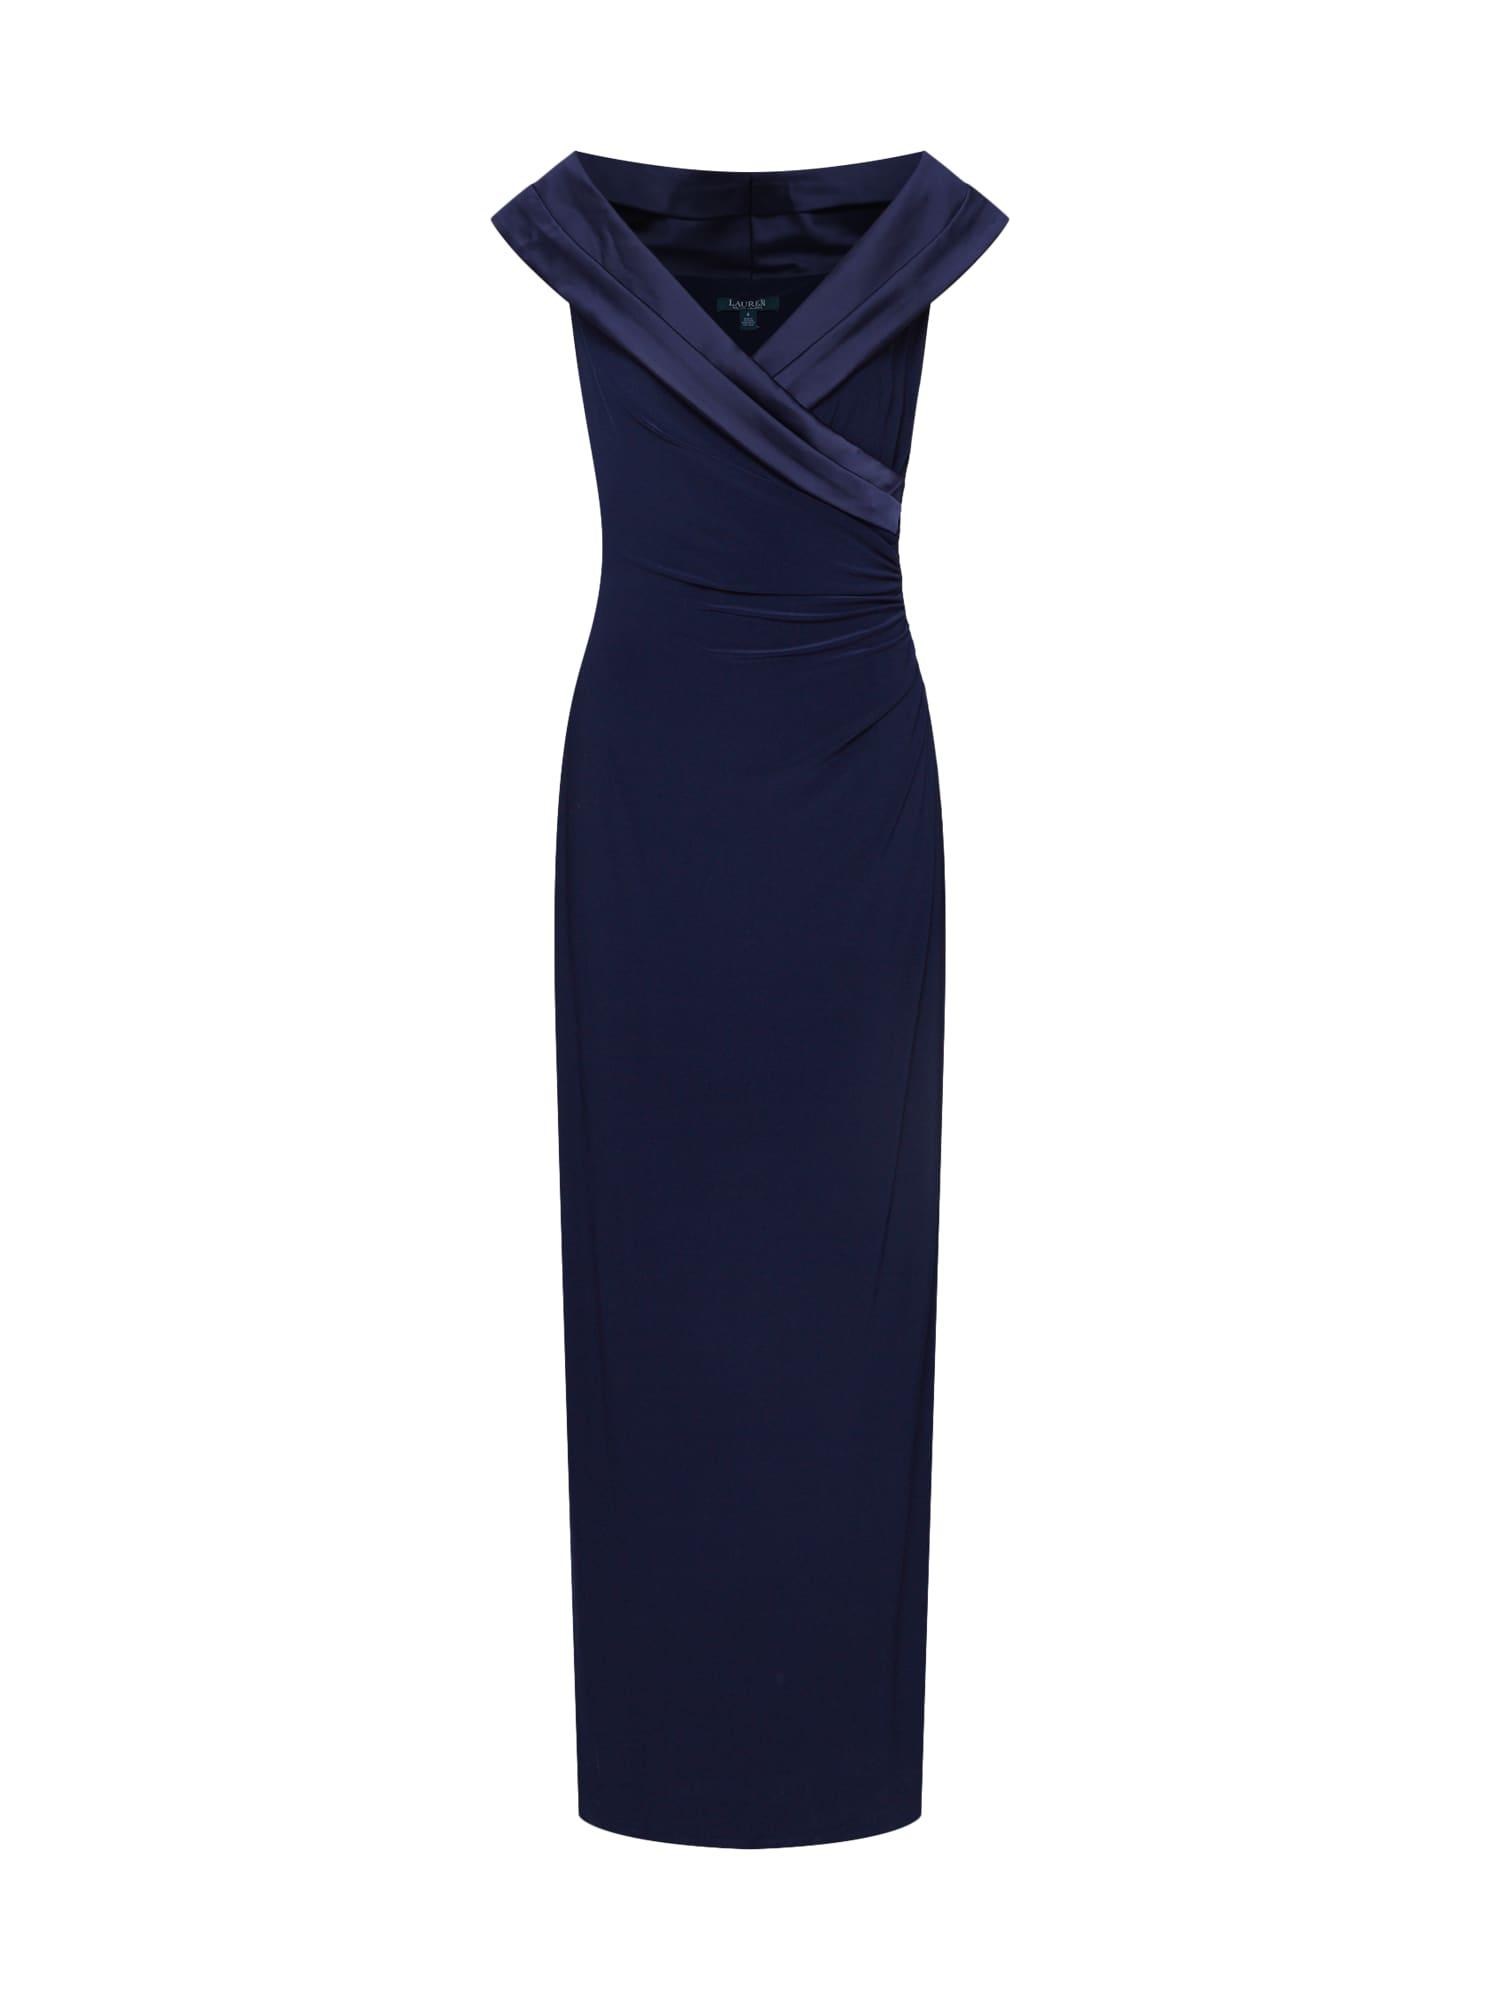 Společenské šaty LEONETTA námořnická modř Lauren Ralph Lauren